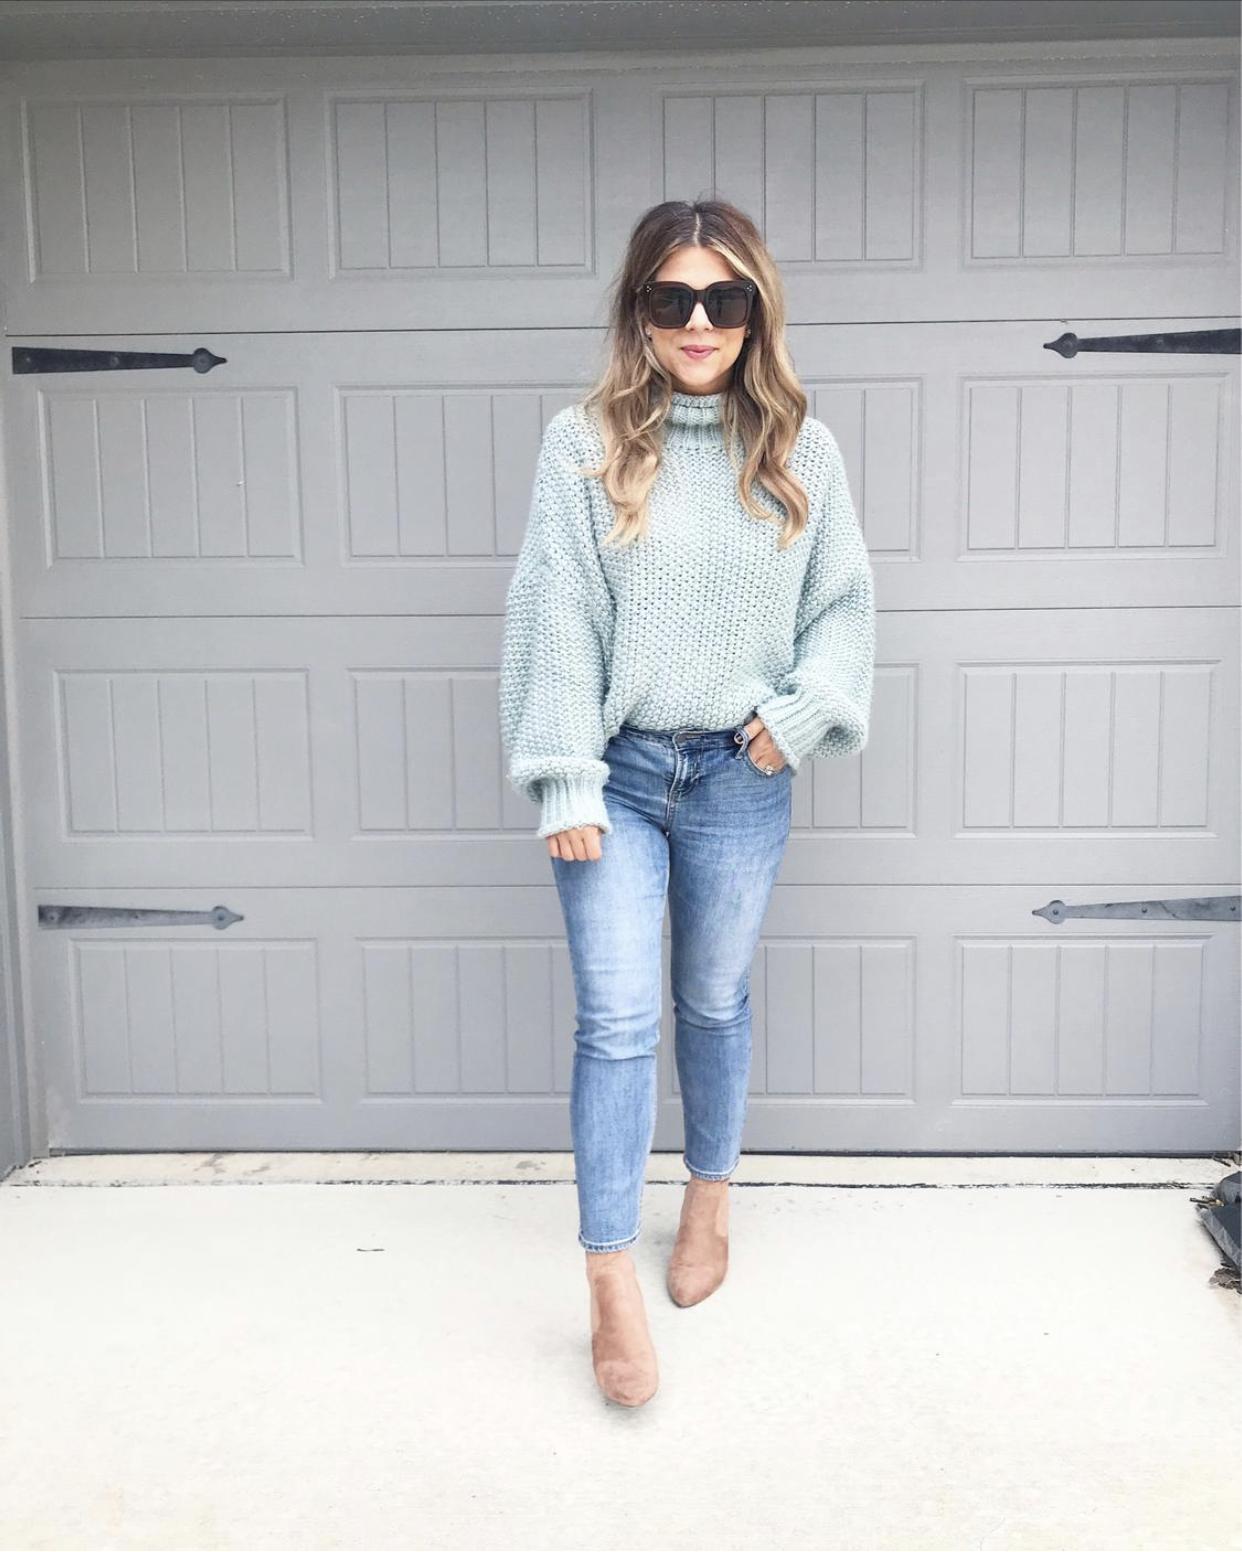 Chunky Sweater, Straight leg jeans, Steven Madden Booties, Sock Booties, Celine Sunglasses